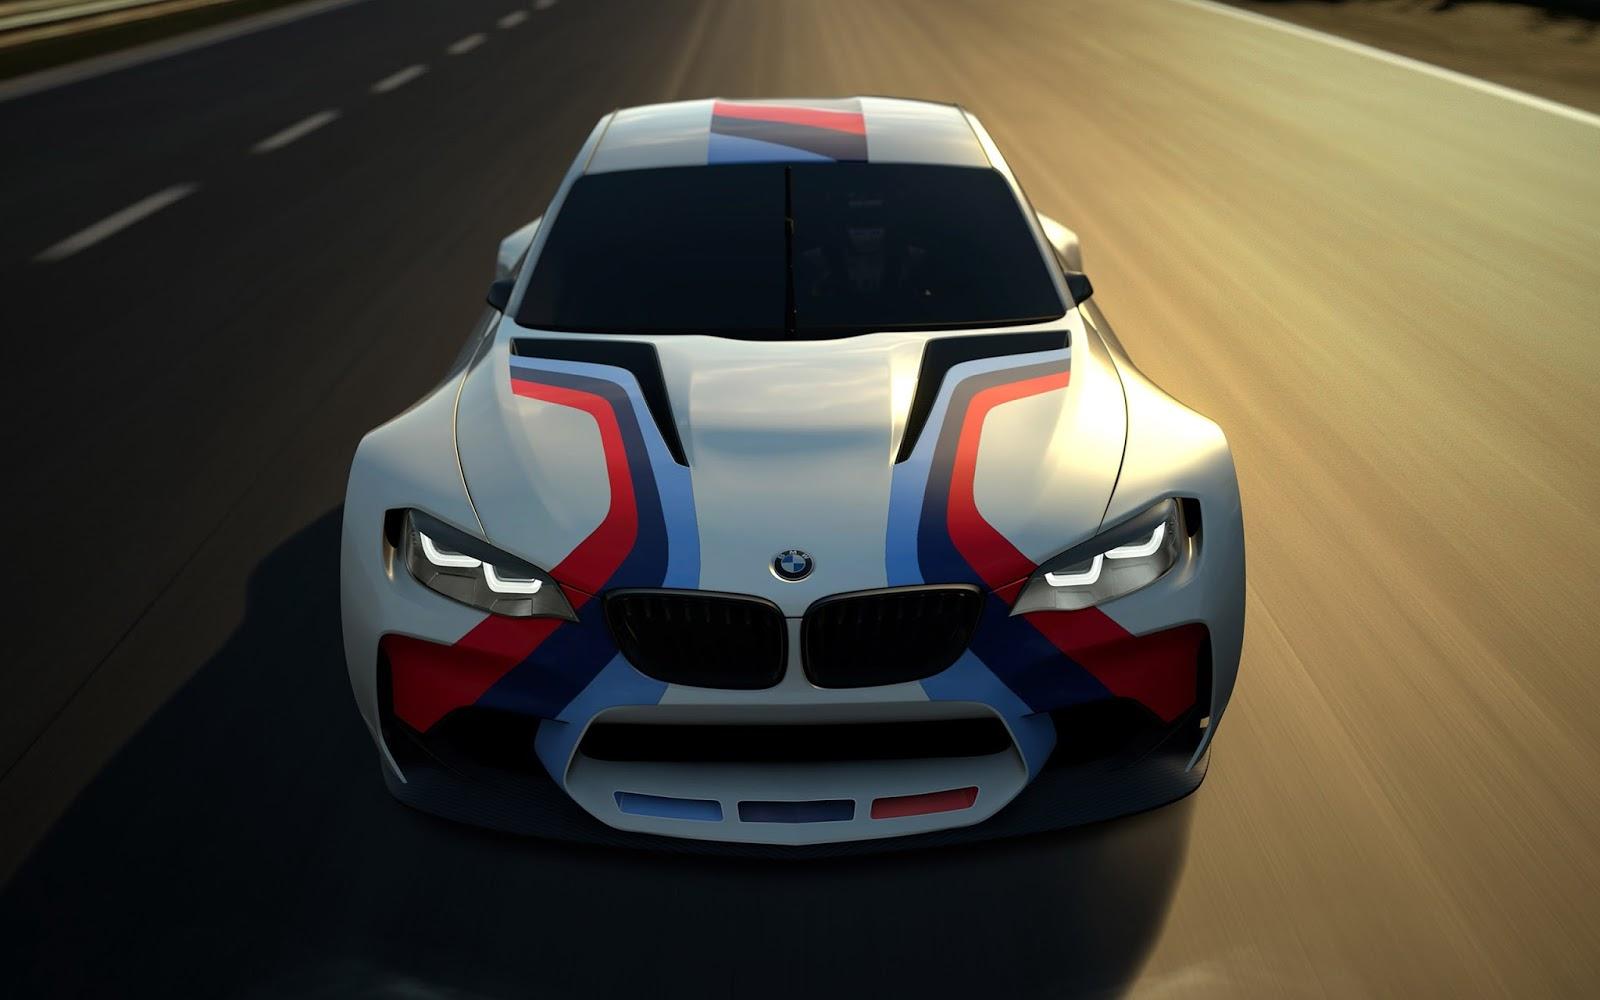 Sports Car Android Wallpaper. 4K Wallpaper